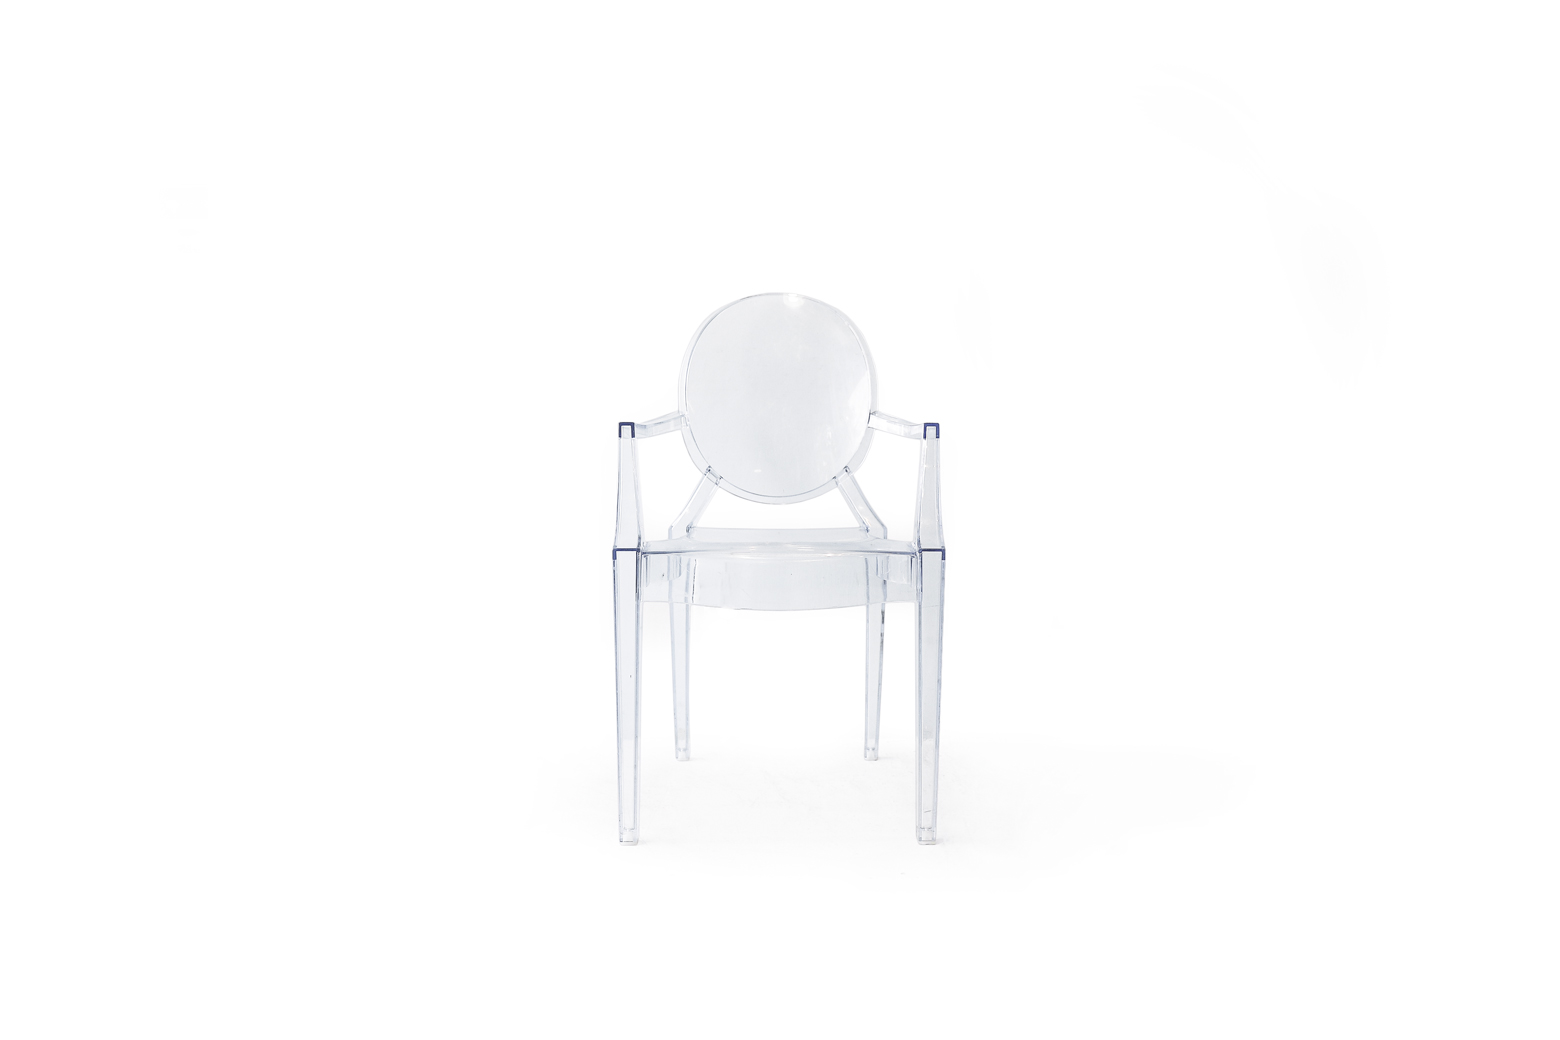 Kartell Louis Ghost Chair Philippe Starck/カルテル ルイゴースト チェア フィリップ・スタルク クリスタル